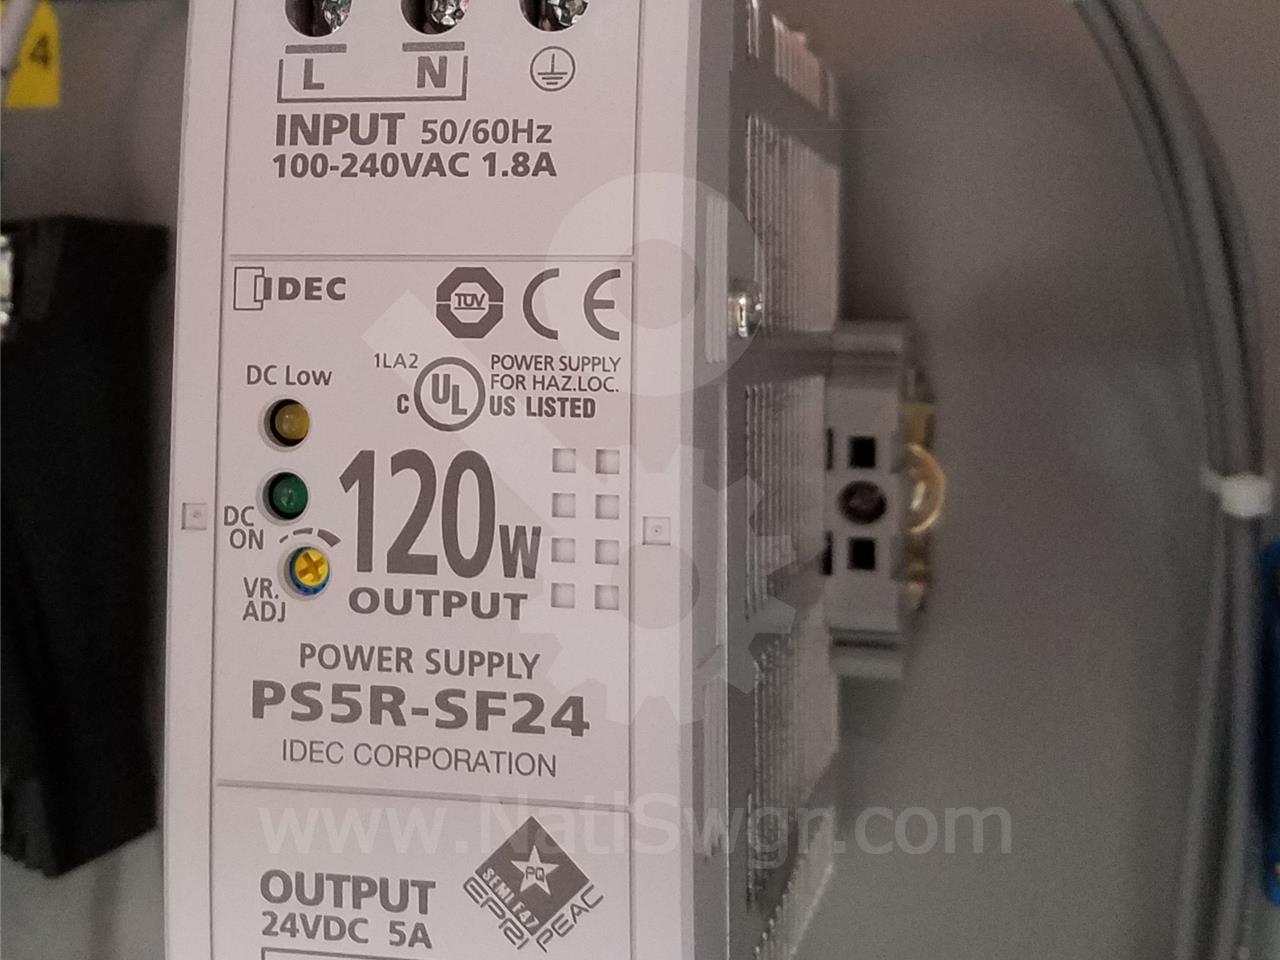 IDEC 24VDC POWER SUPPLY